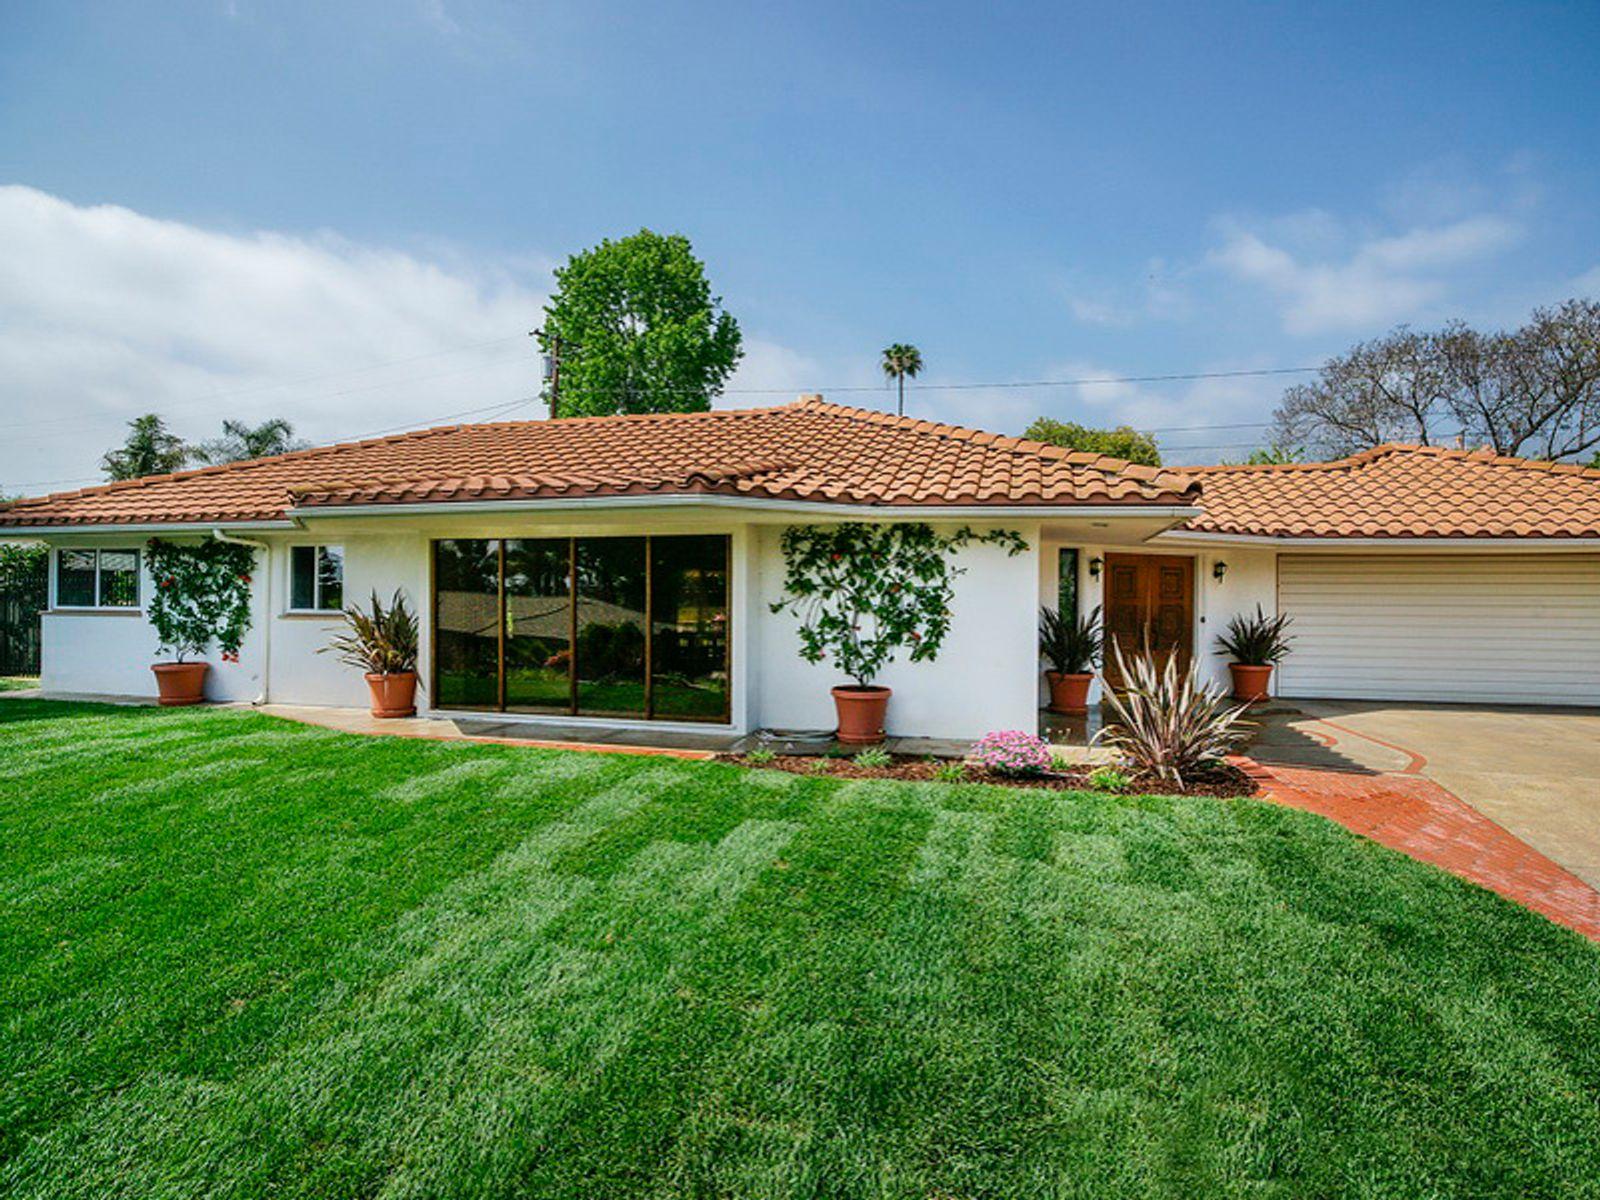 Paul greene contemporary santa barbara ca single family for Santa barbara new homes